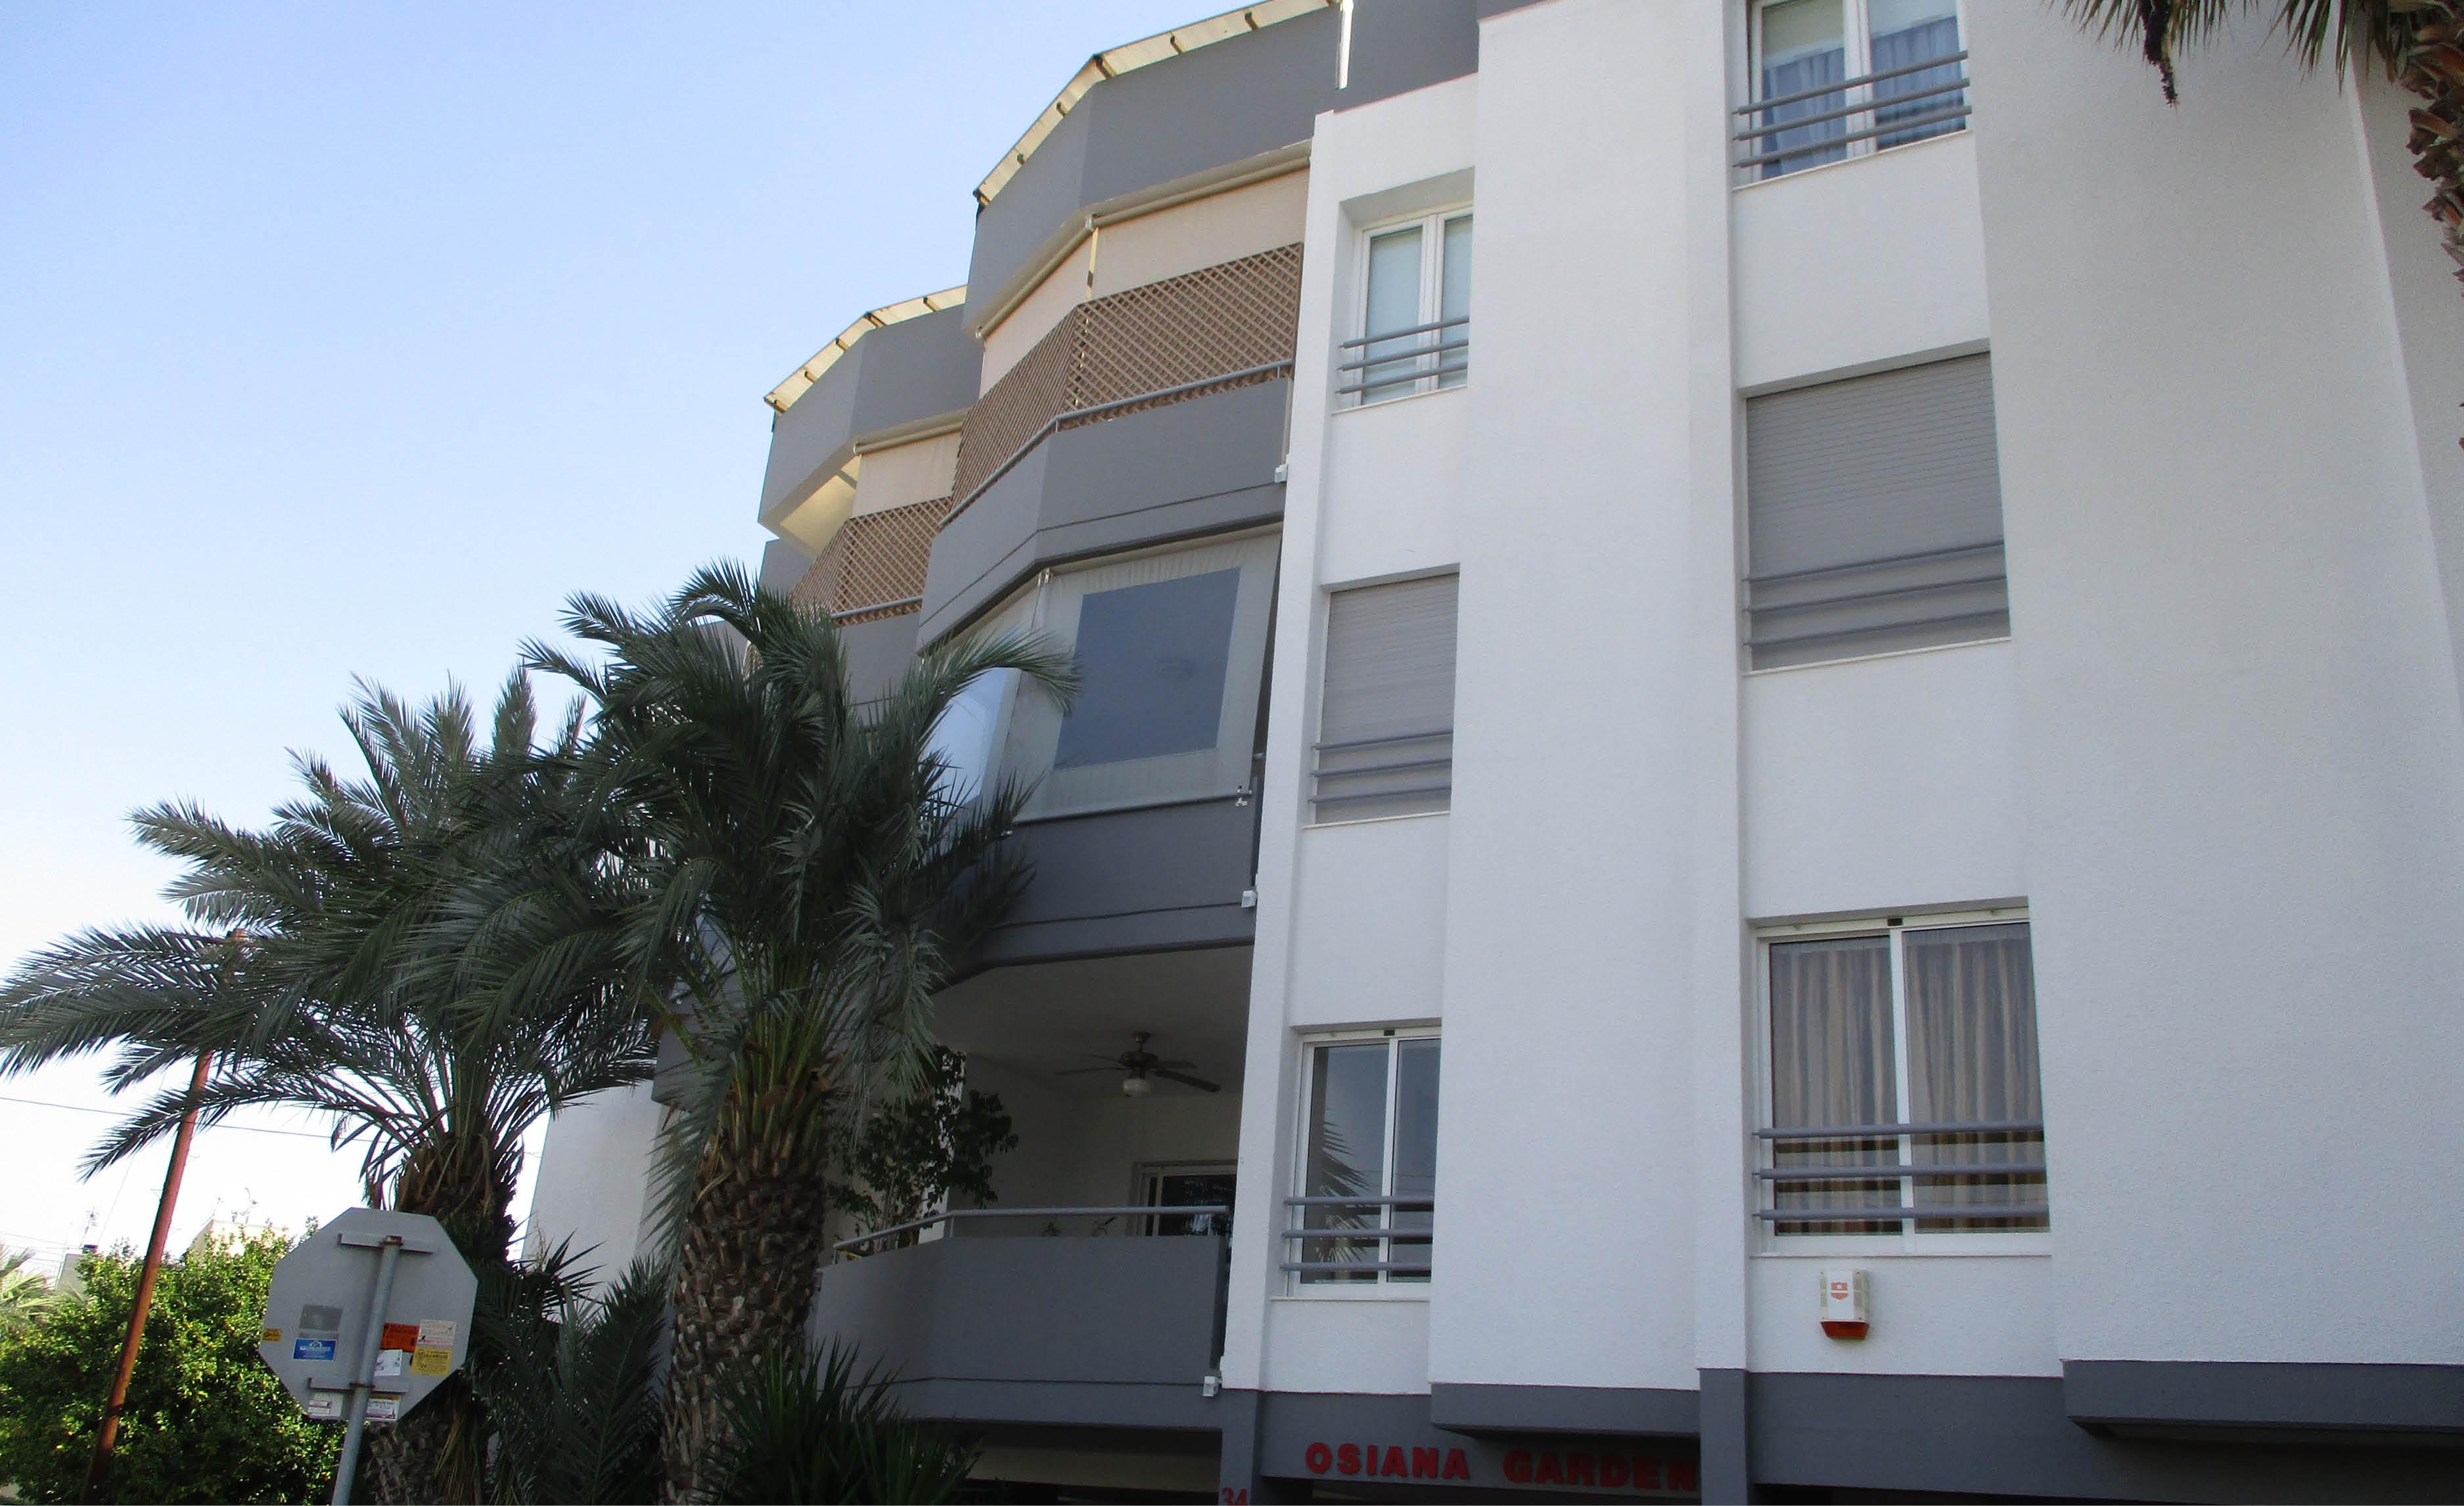 3 Bedroom Apartment For Sale In Potamos Yermasoyias Limassol Louis Estates